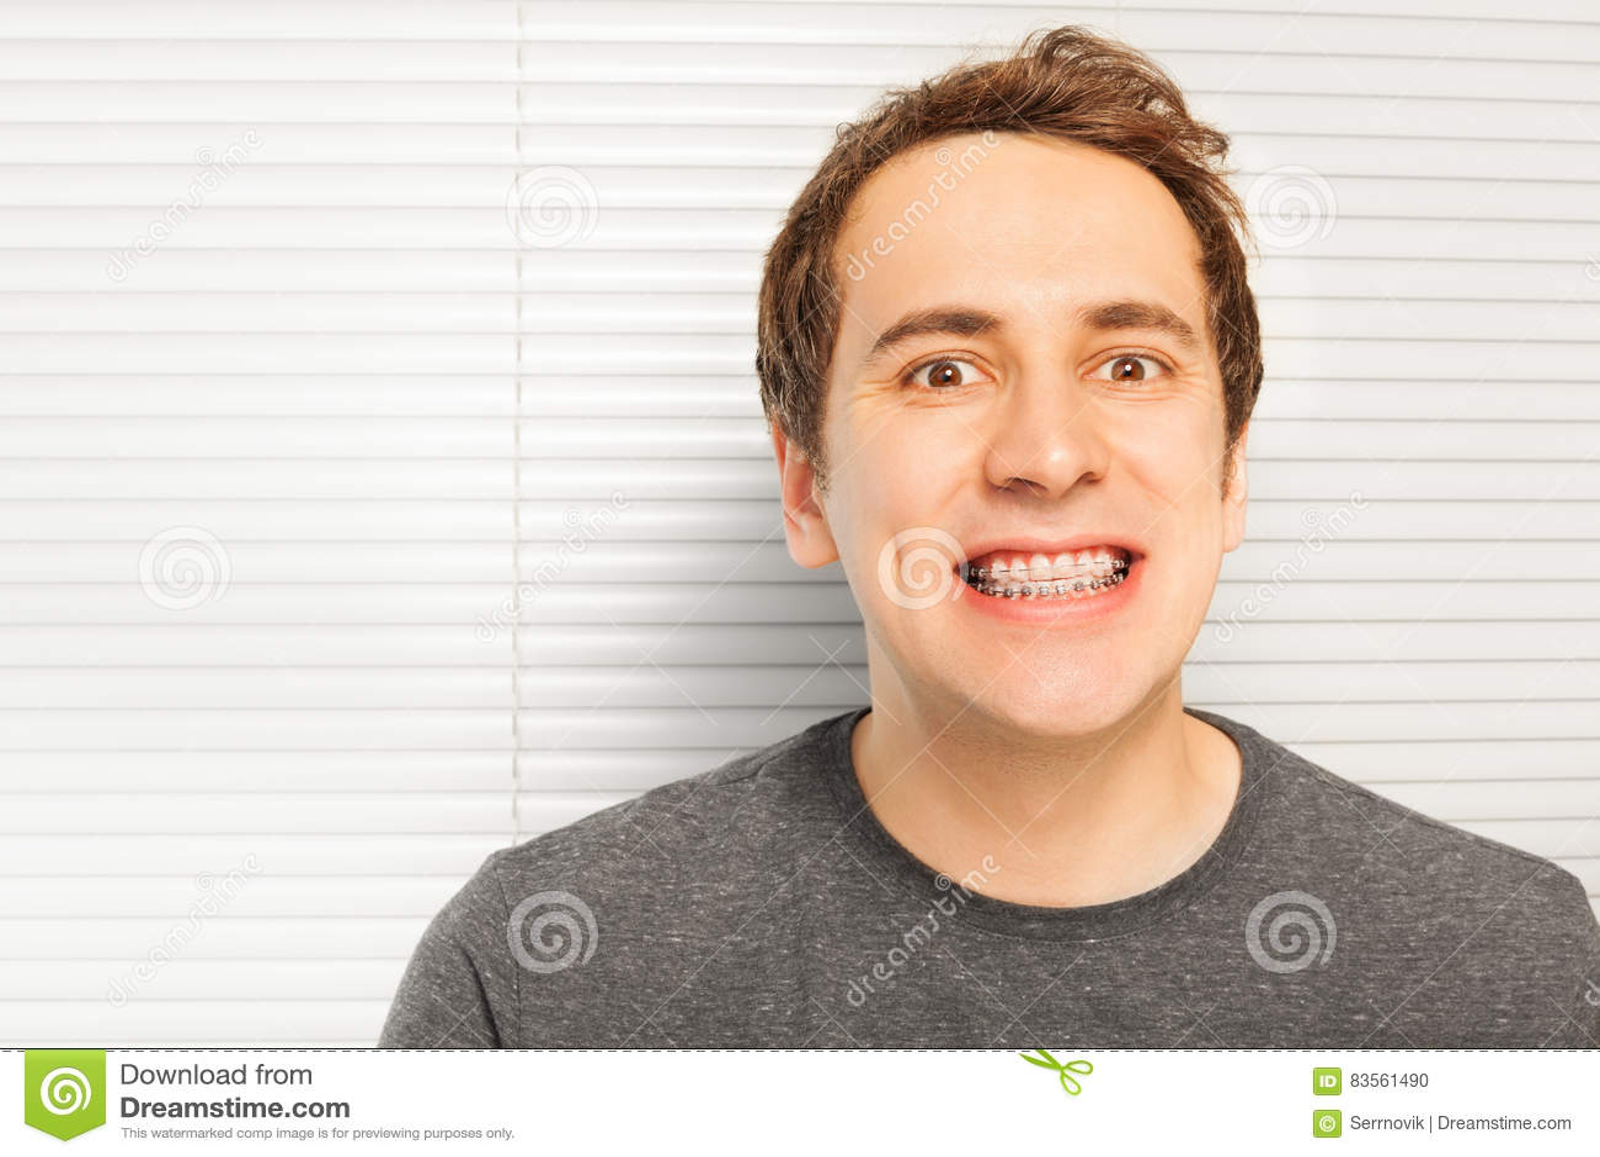 bague homme dent